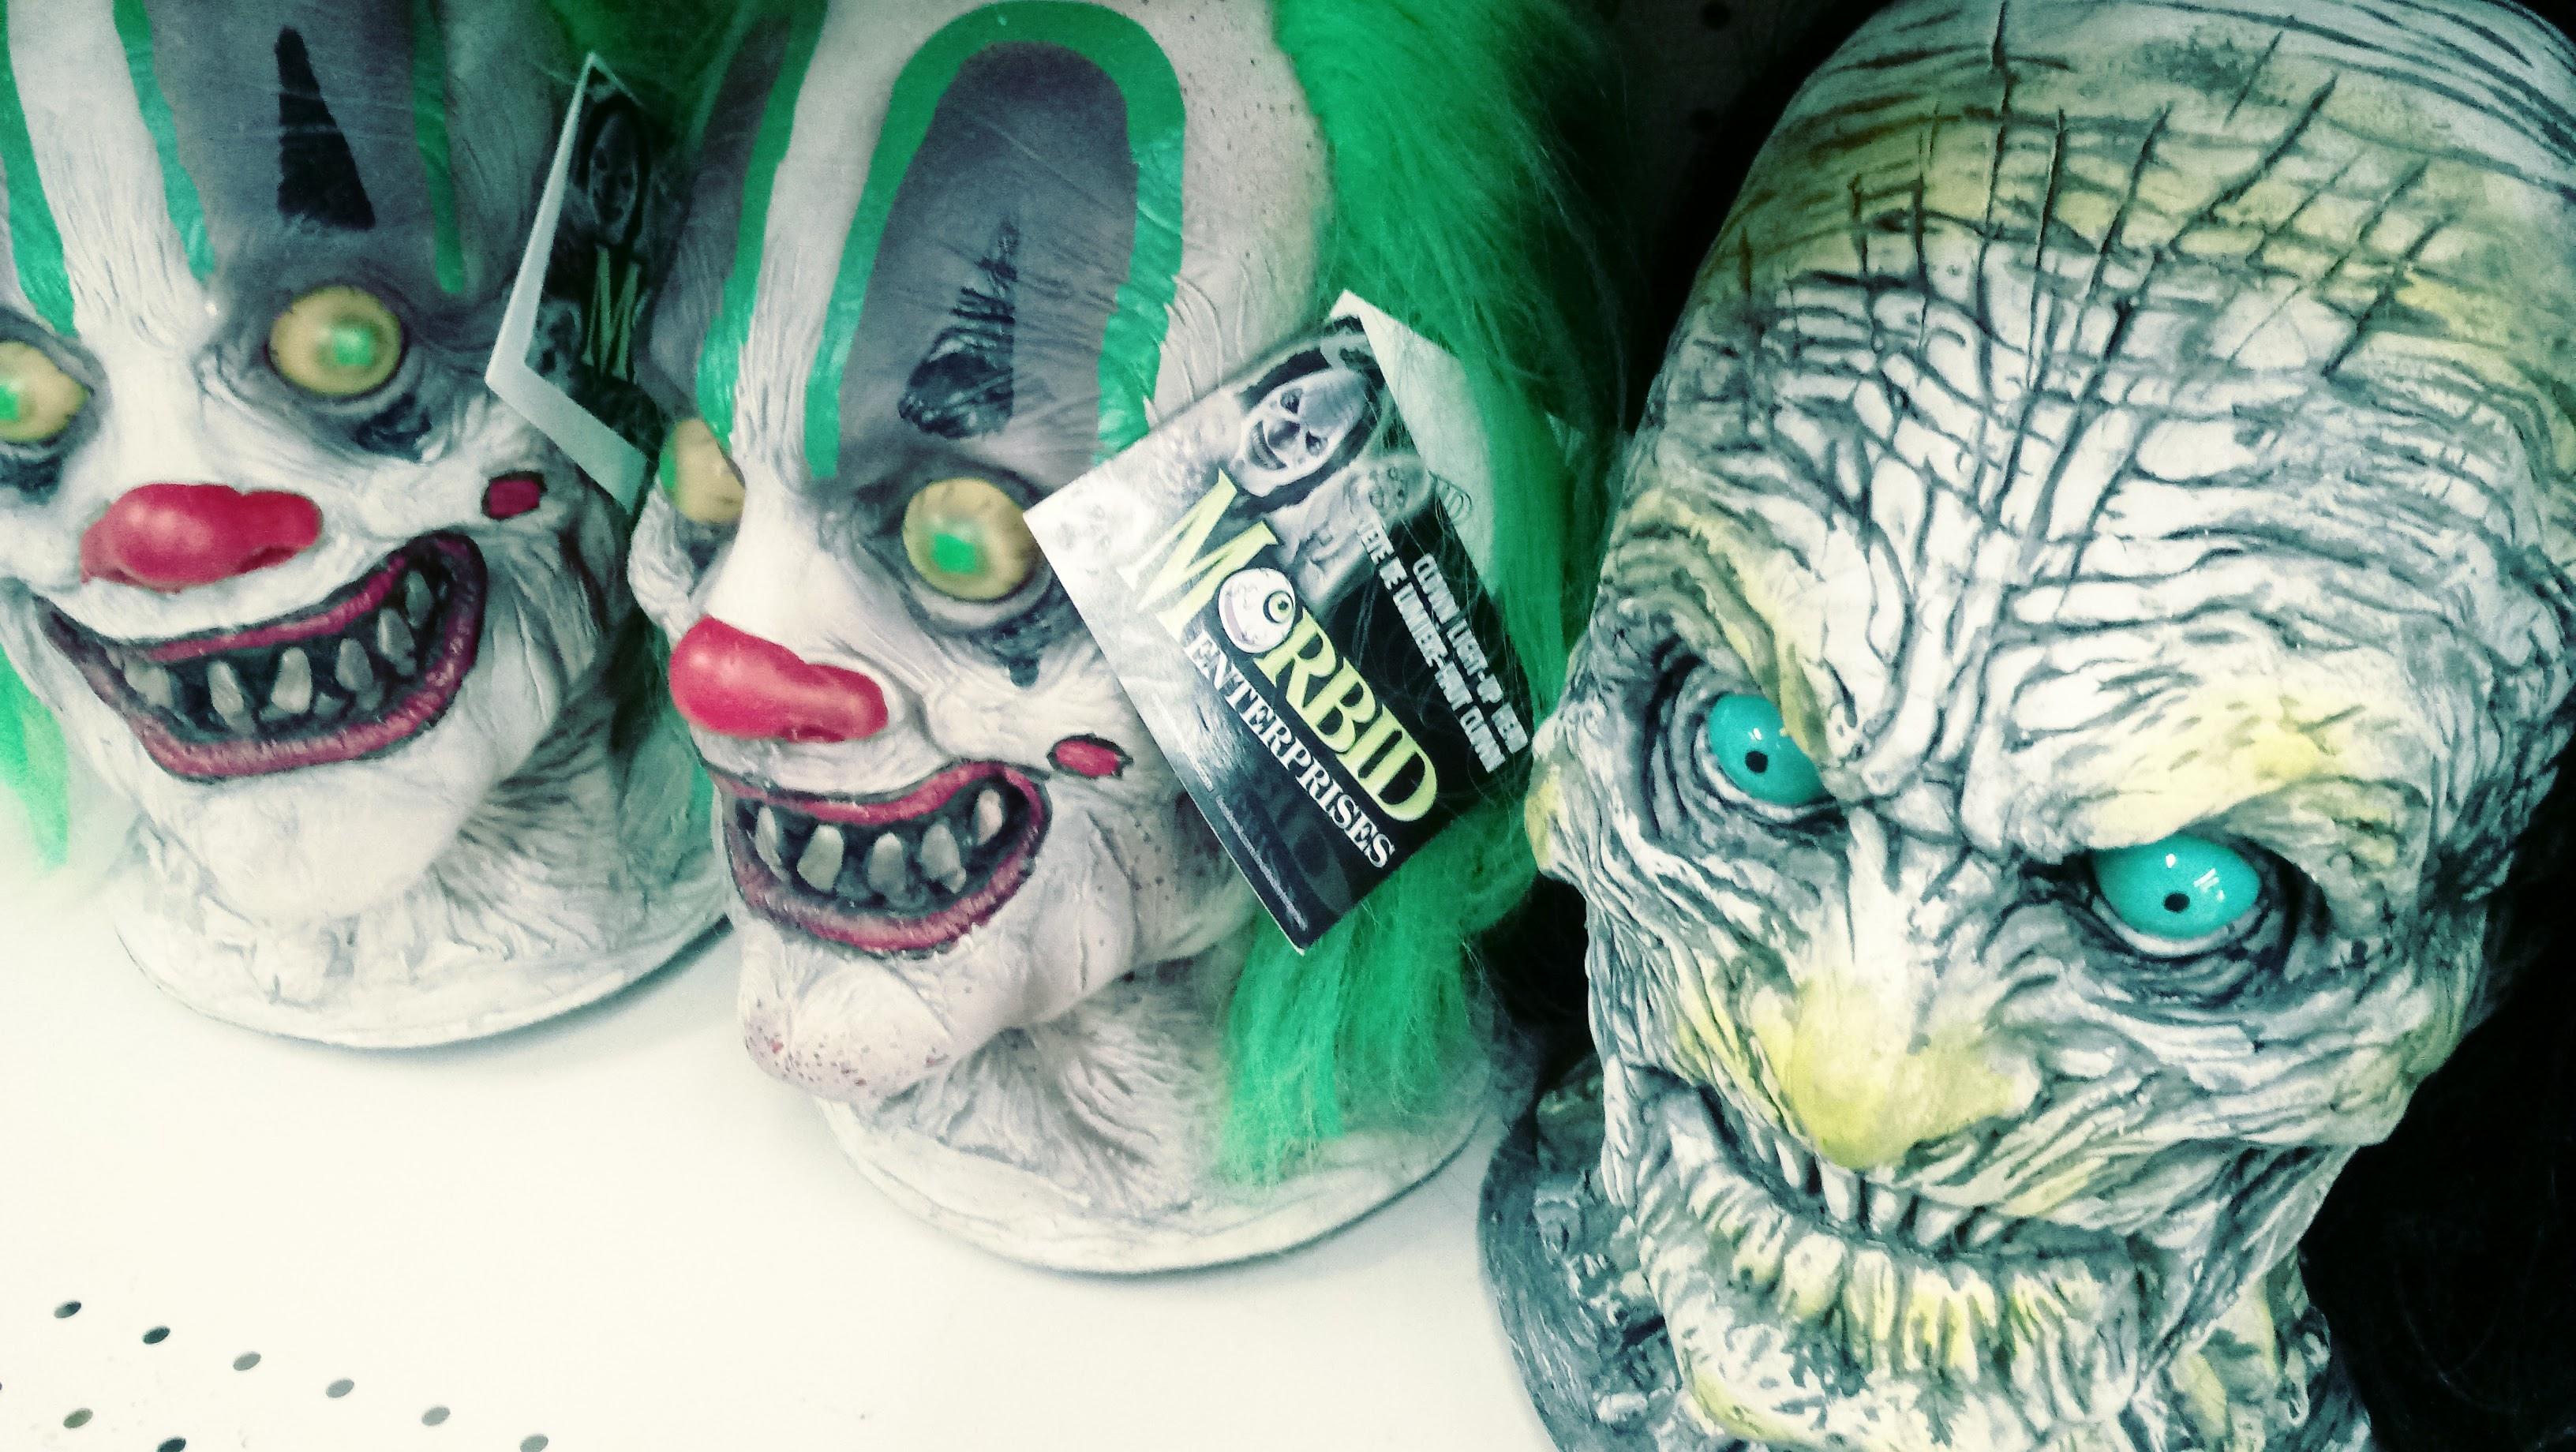 nick nackery morbid enterprises clown masks